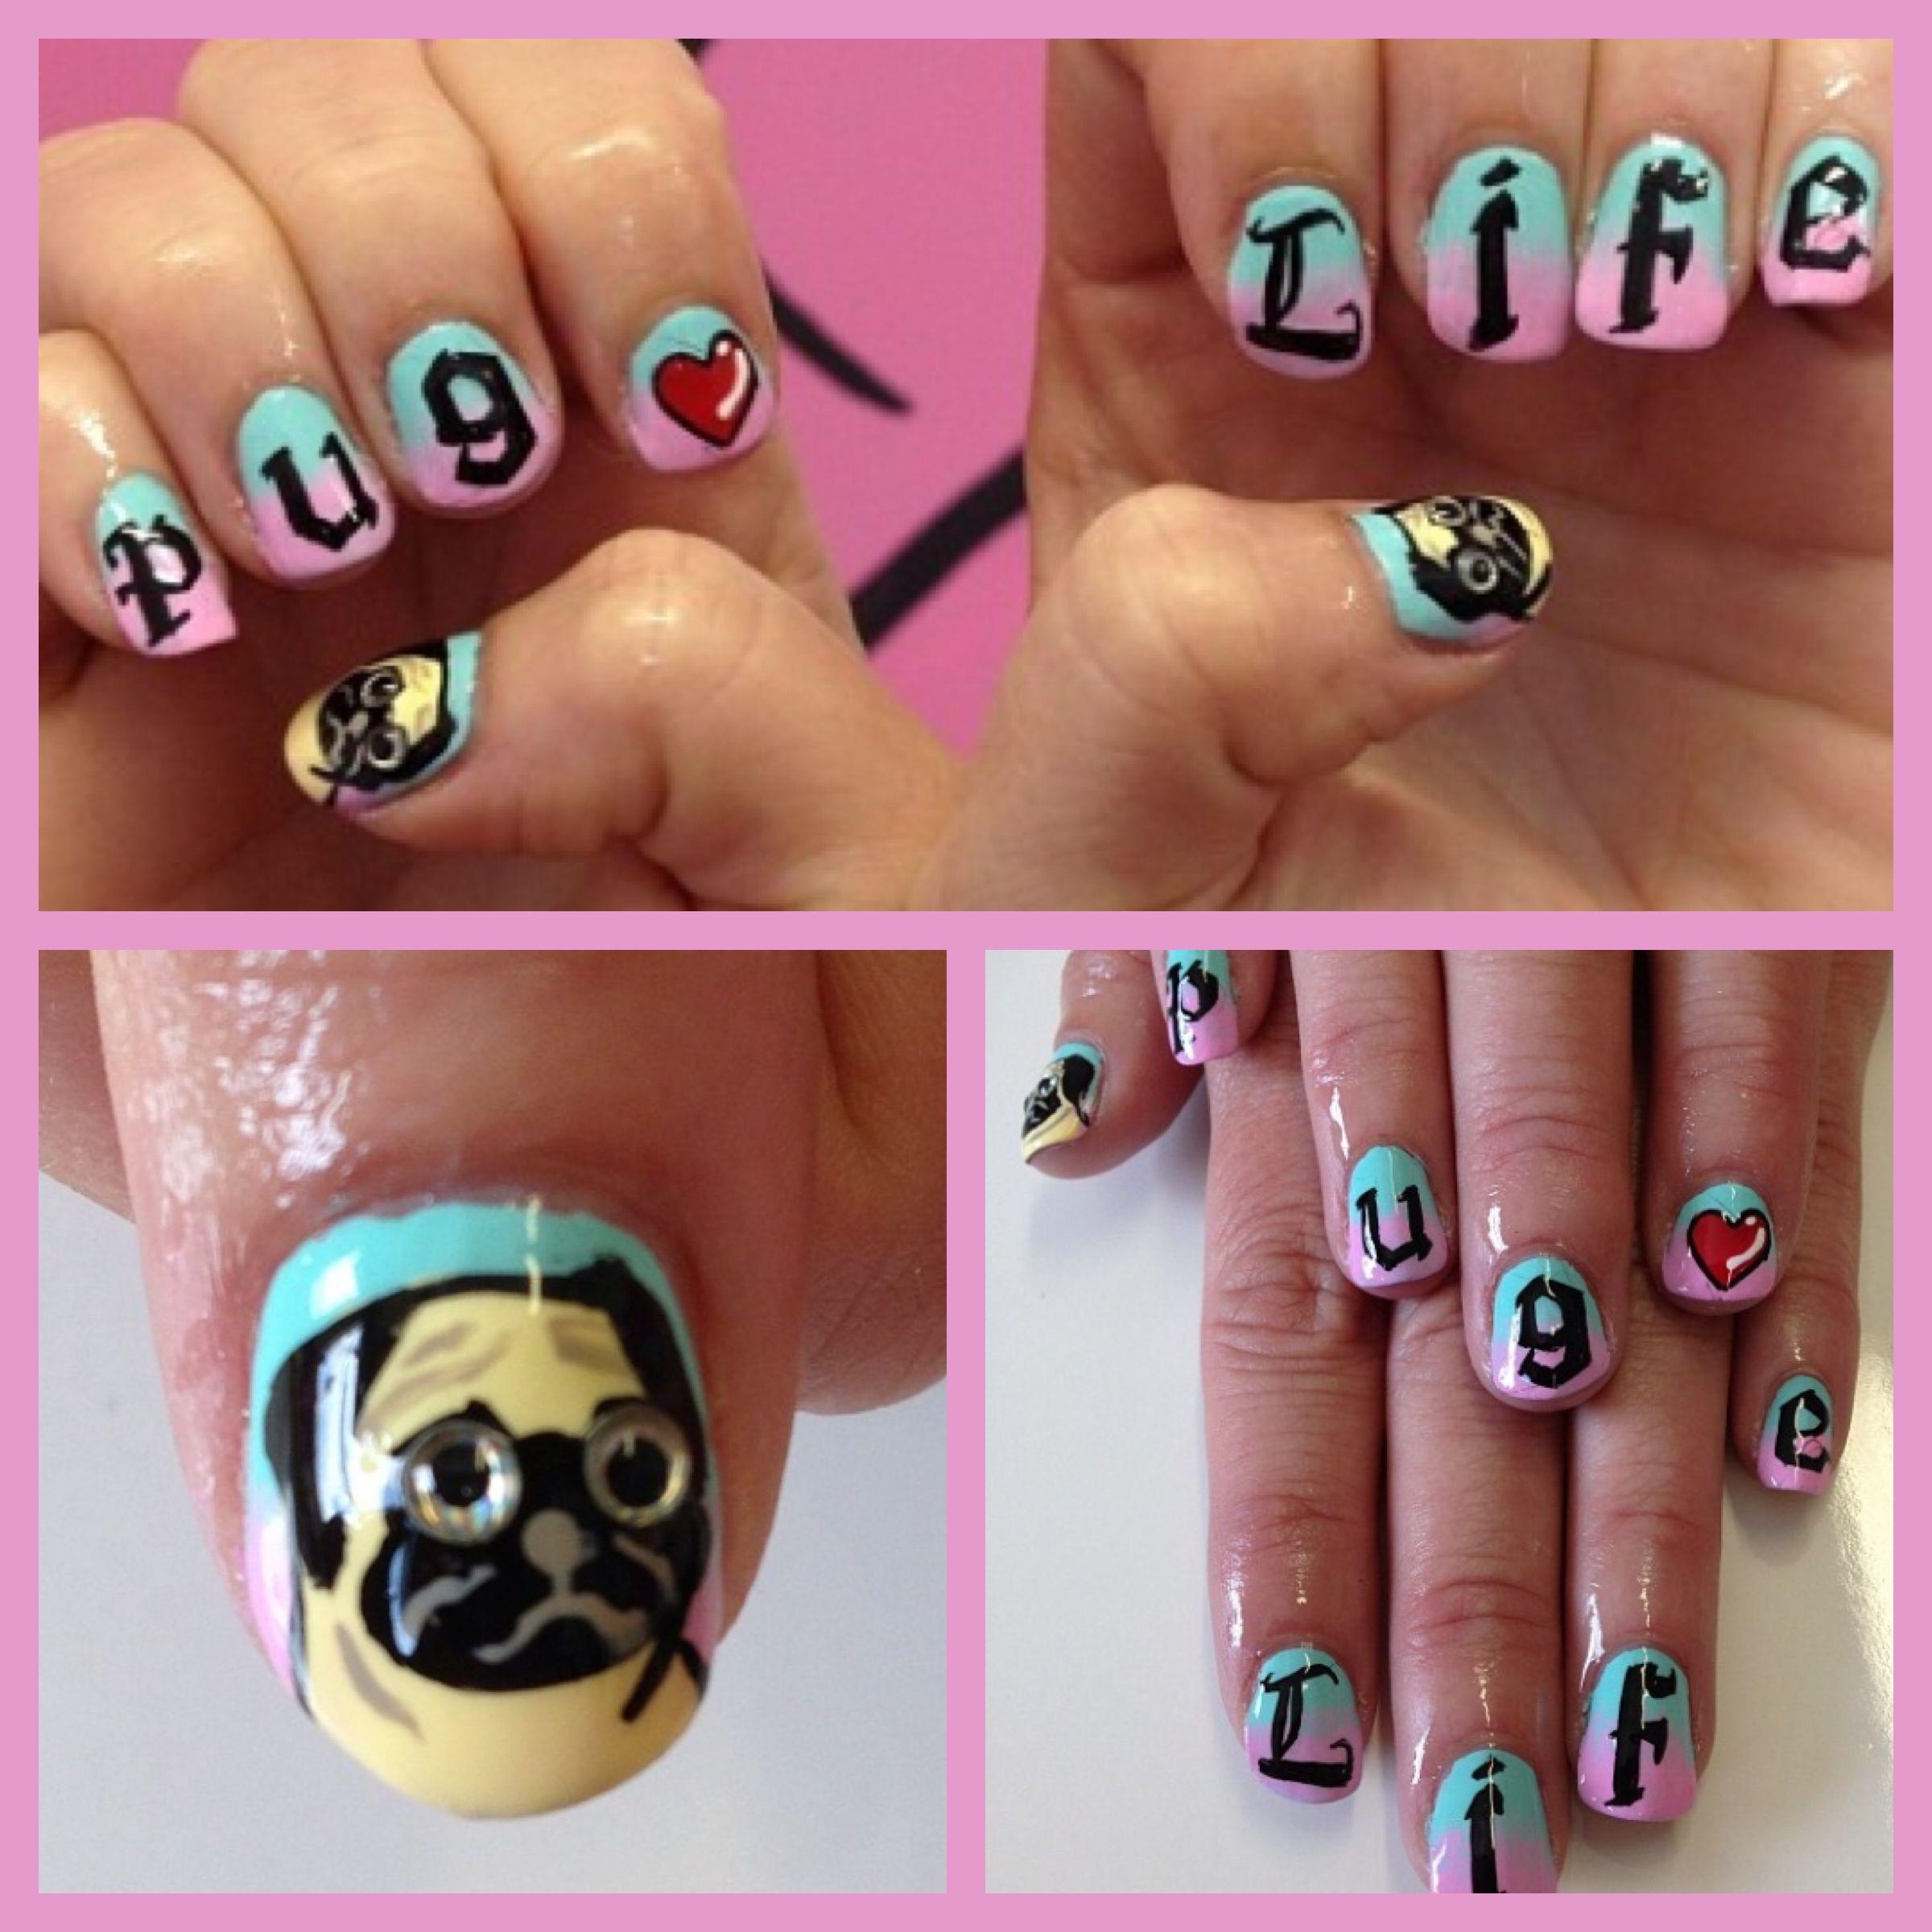 Pug Life nails @I Scream Nails | Nails | Pinterest | Pug life ...